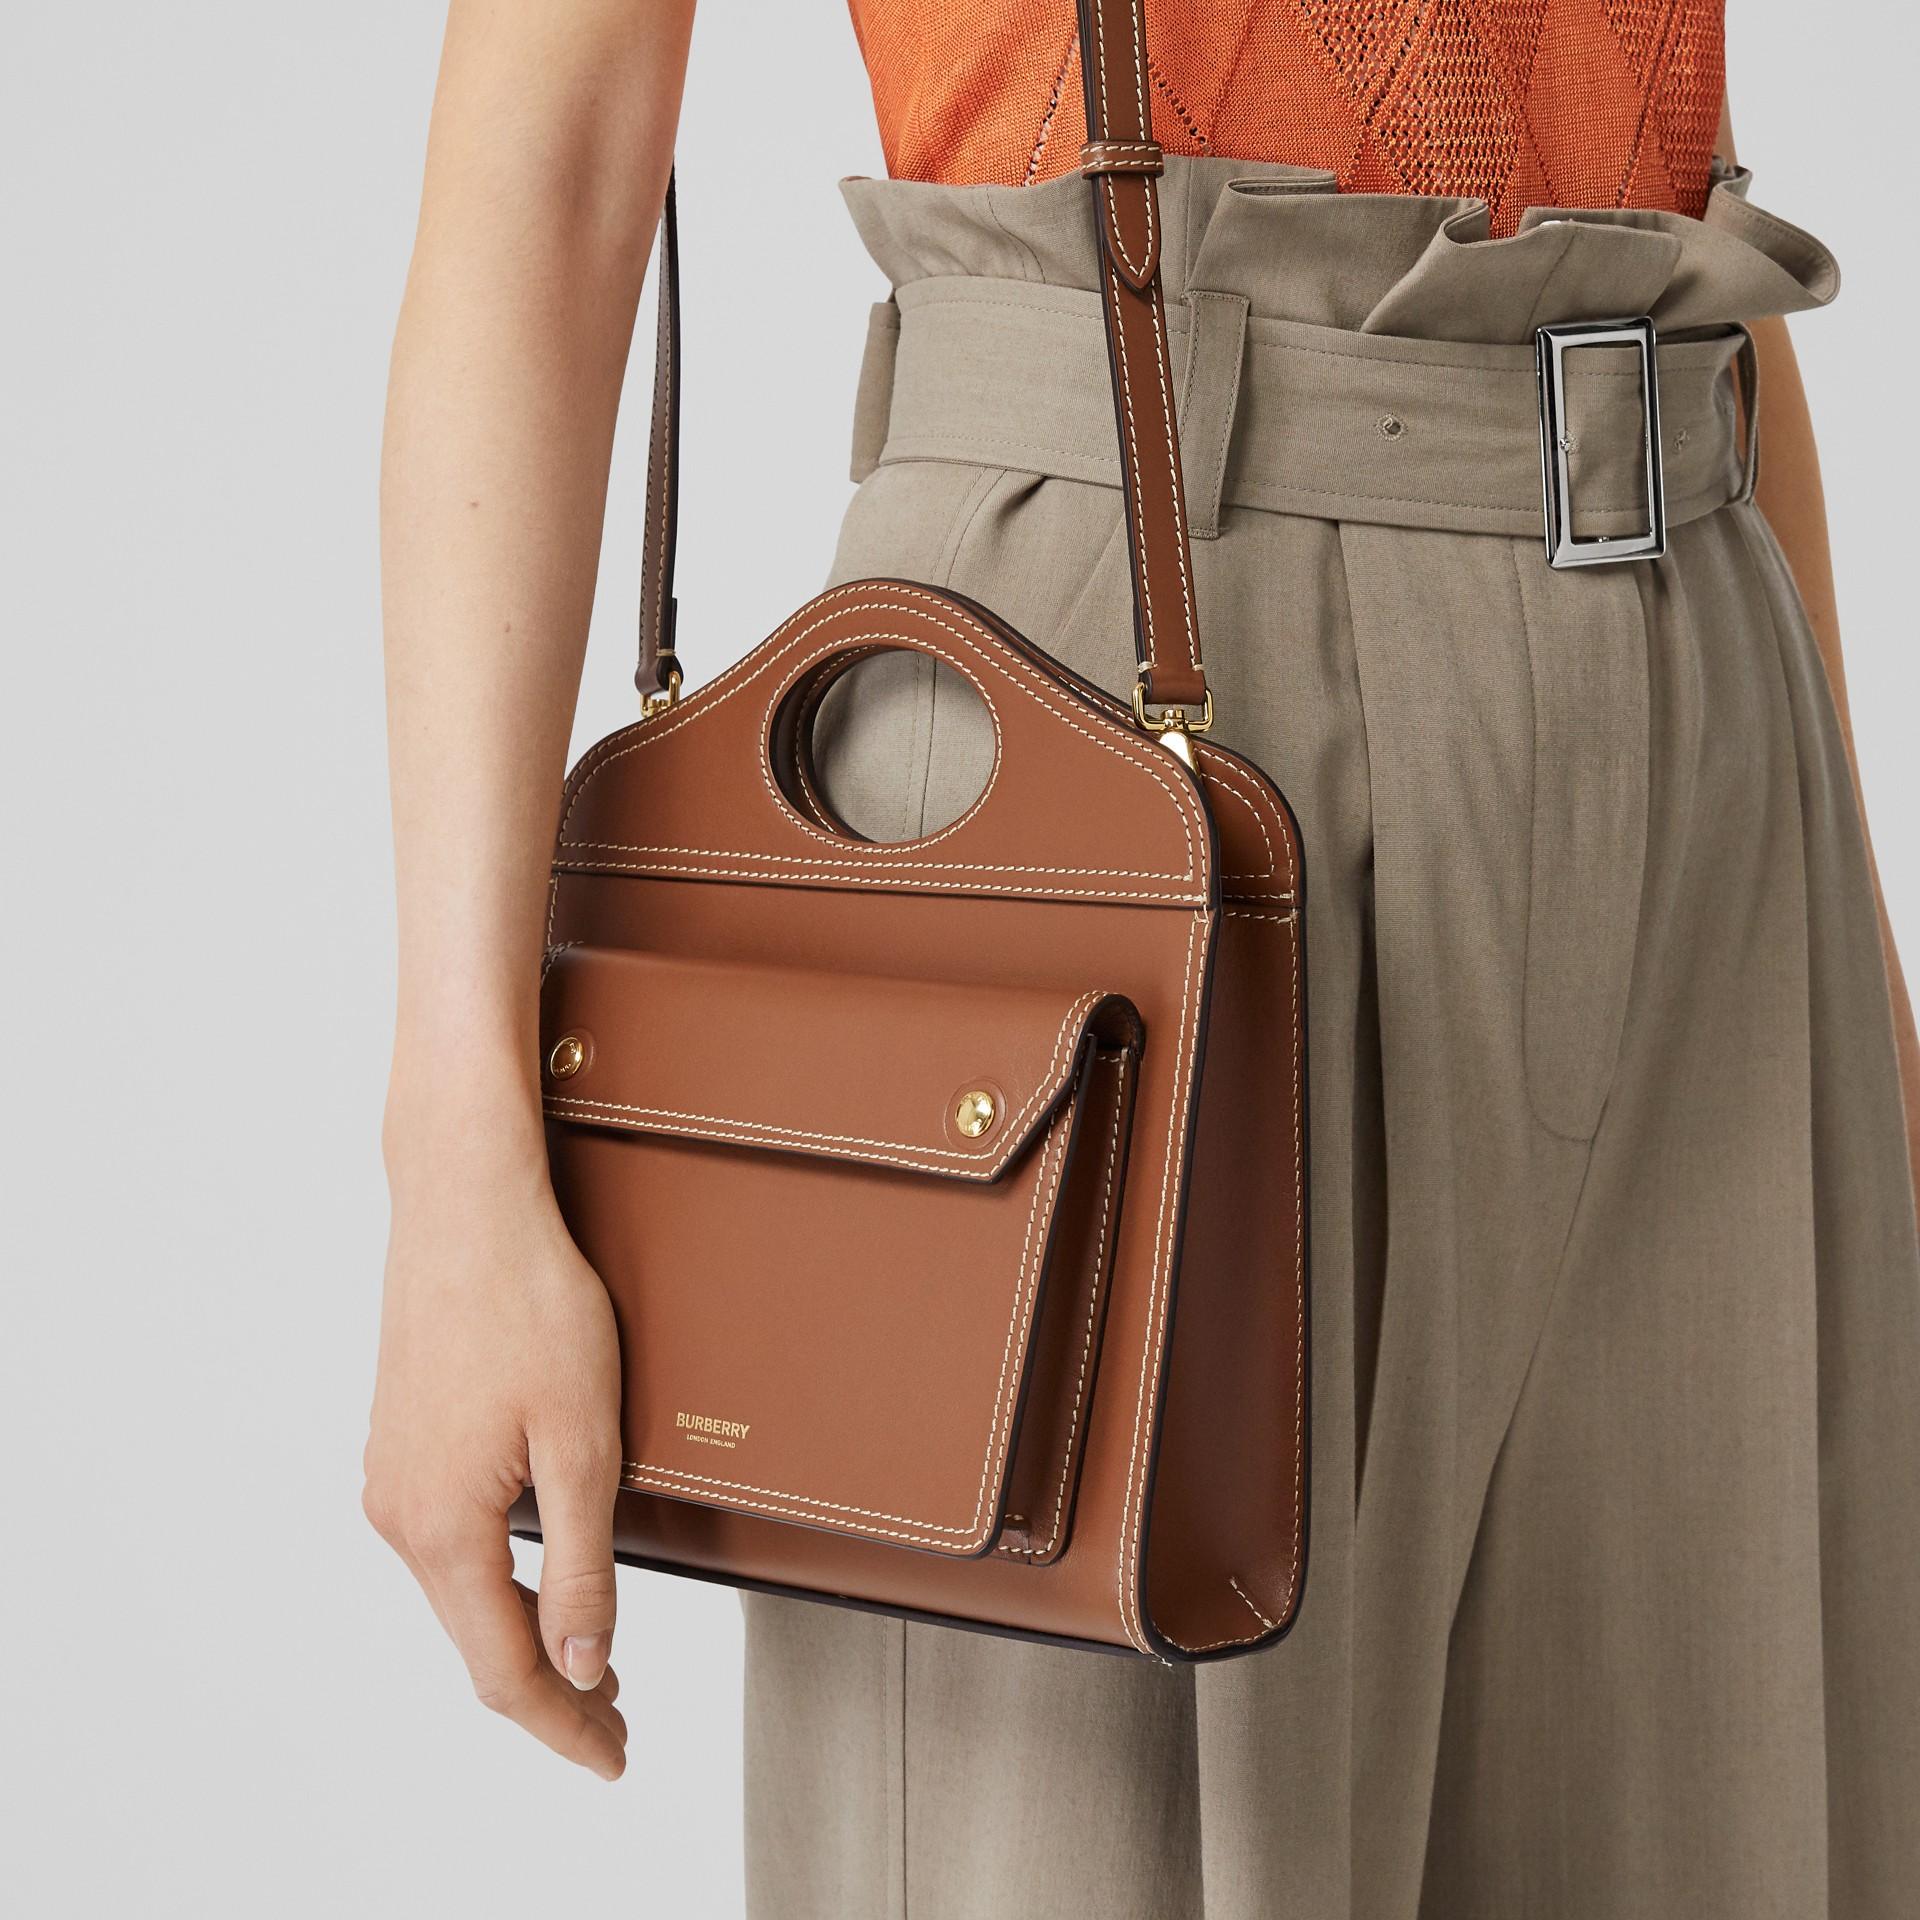 Mini Topstitch Detail Leather Pocket Bag in Malt Brown - Women | Burberry United Kingdom - gallery image 2